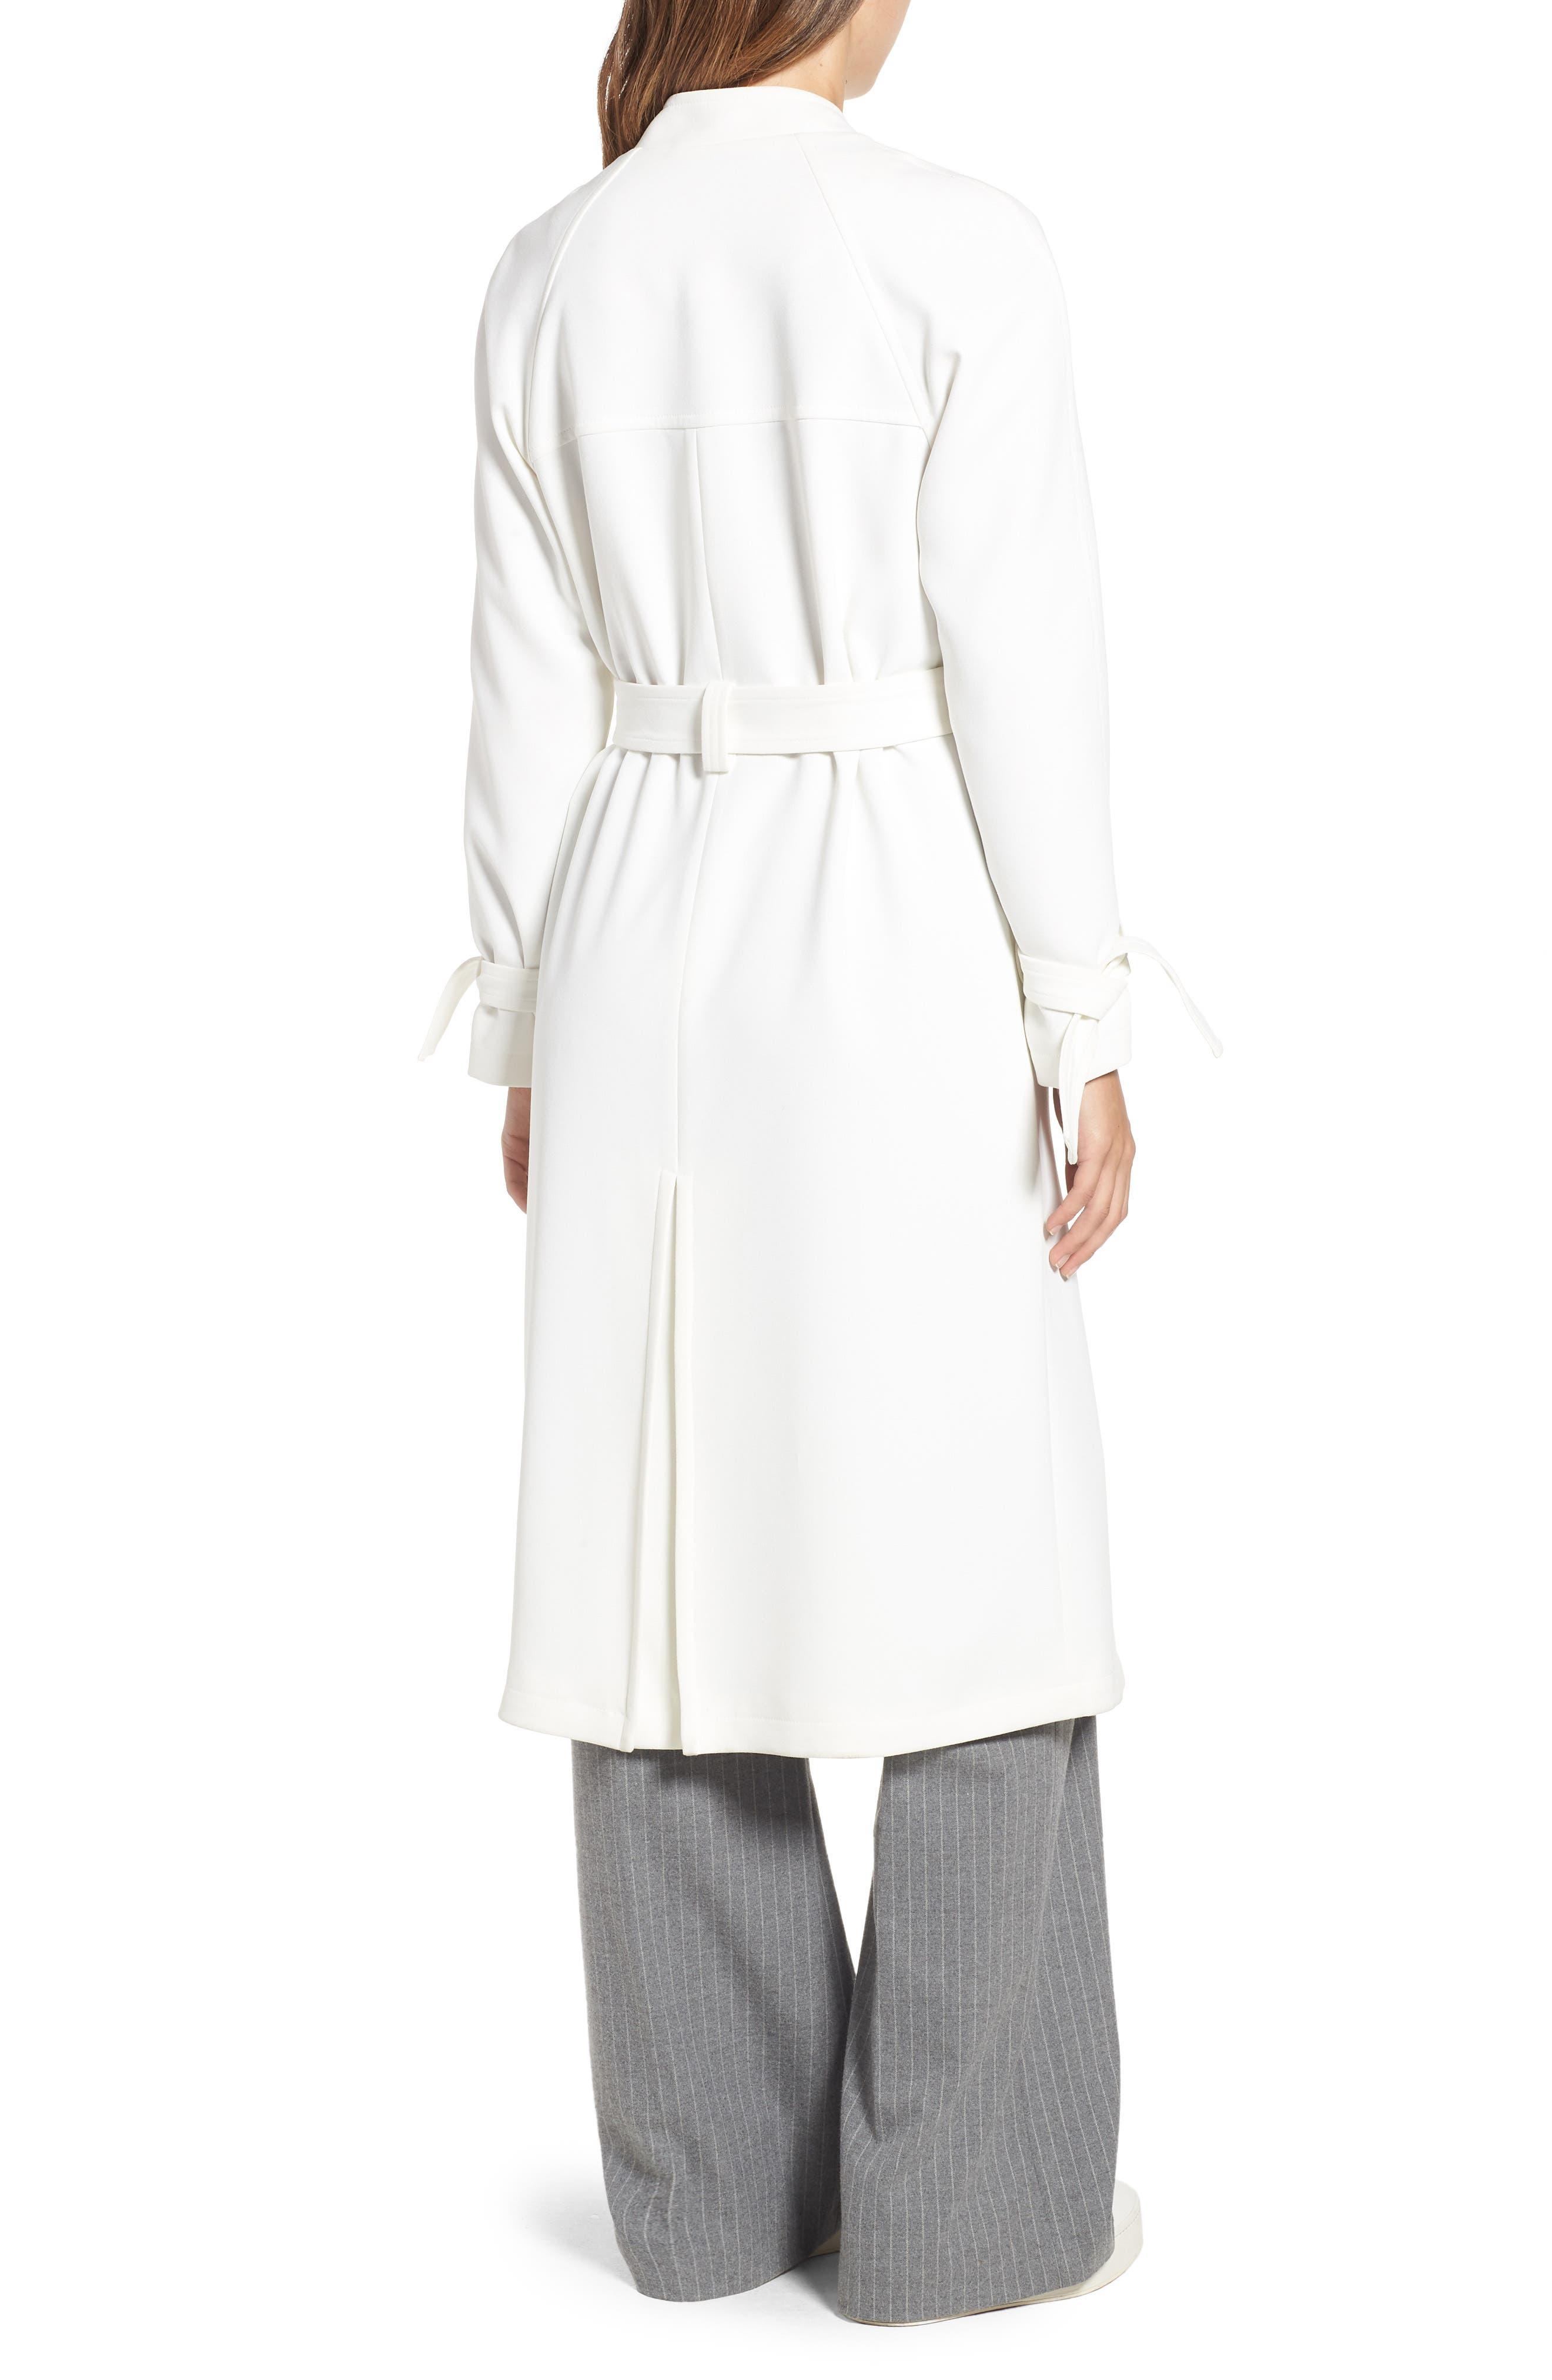 RACHEL RACHEL ROY, Luxe Crepe Trench Coat, Alternate thumbnail 2, color, WHITE